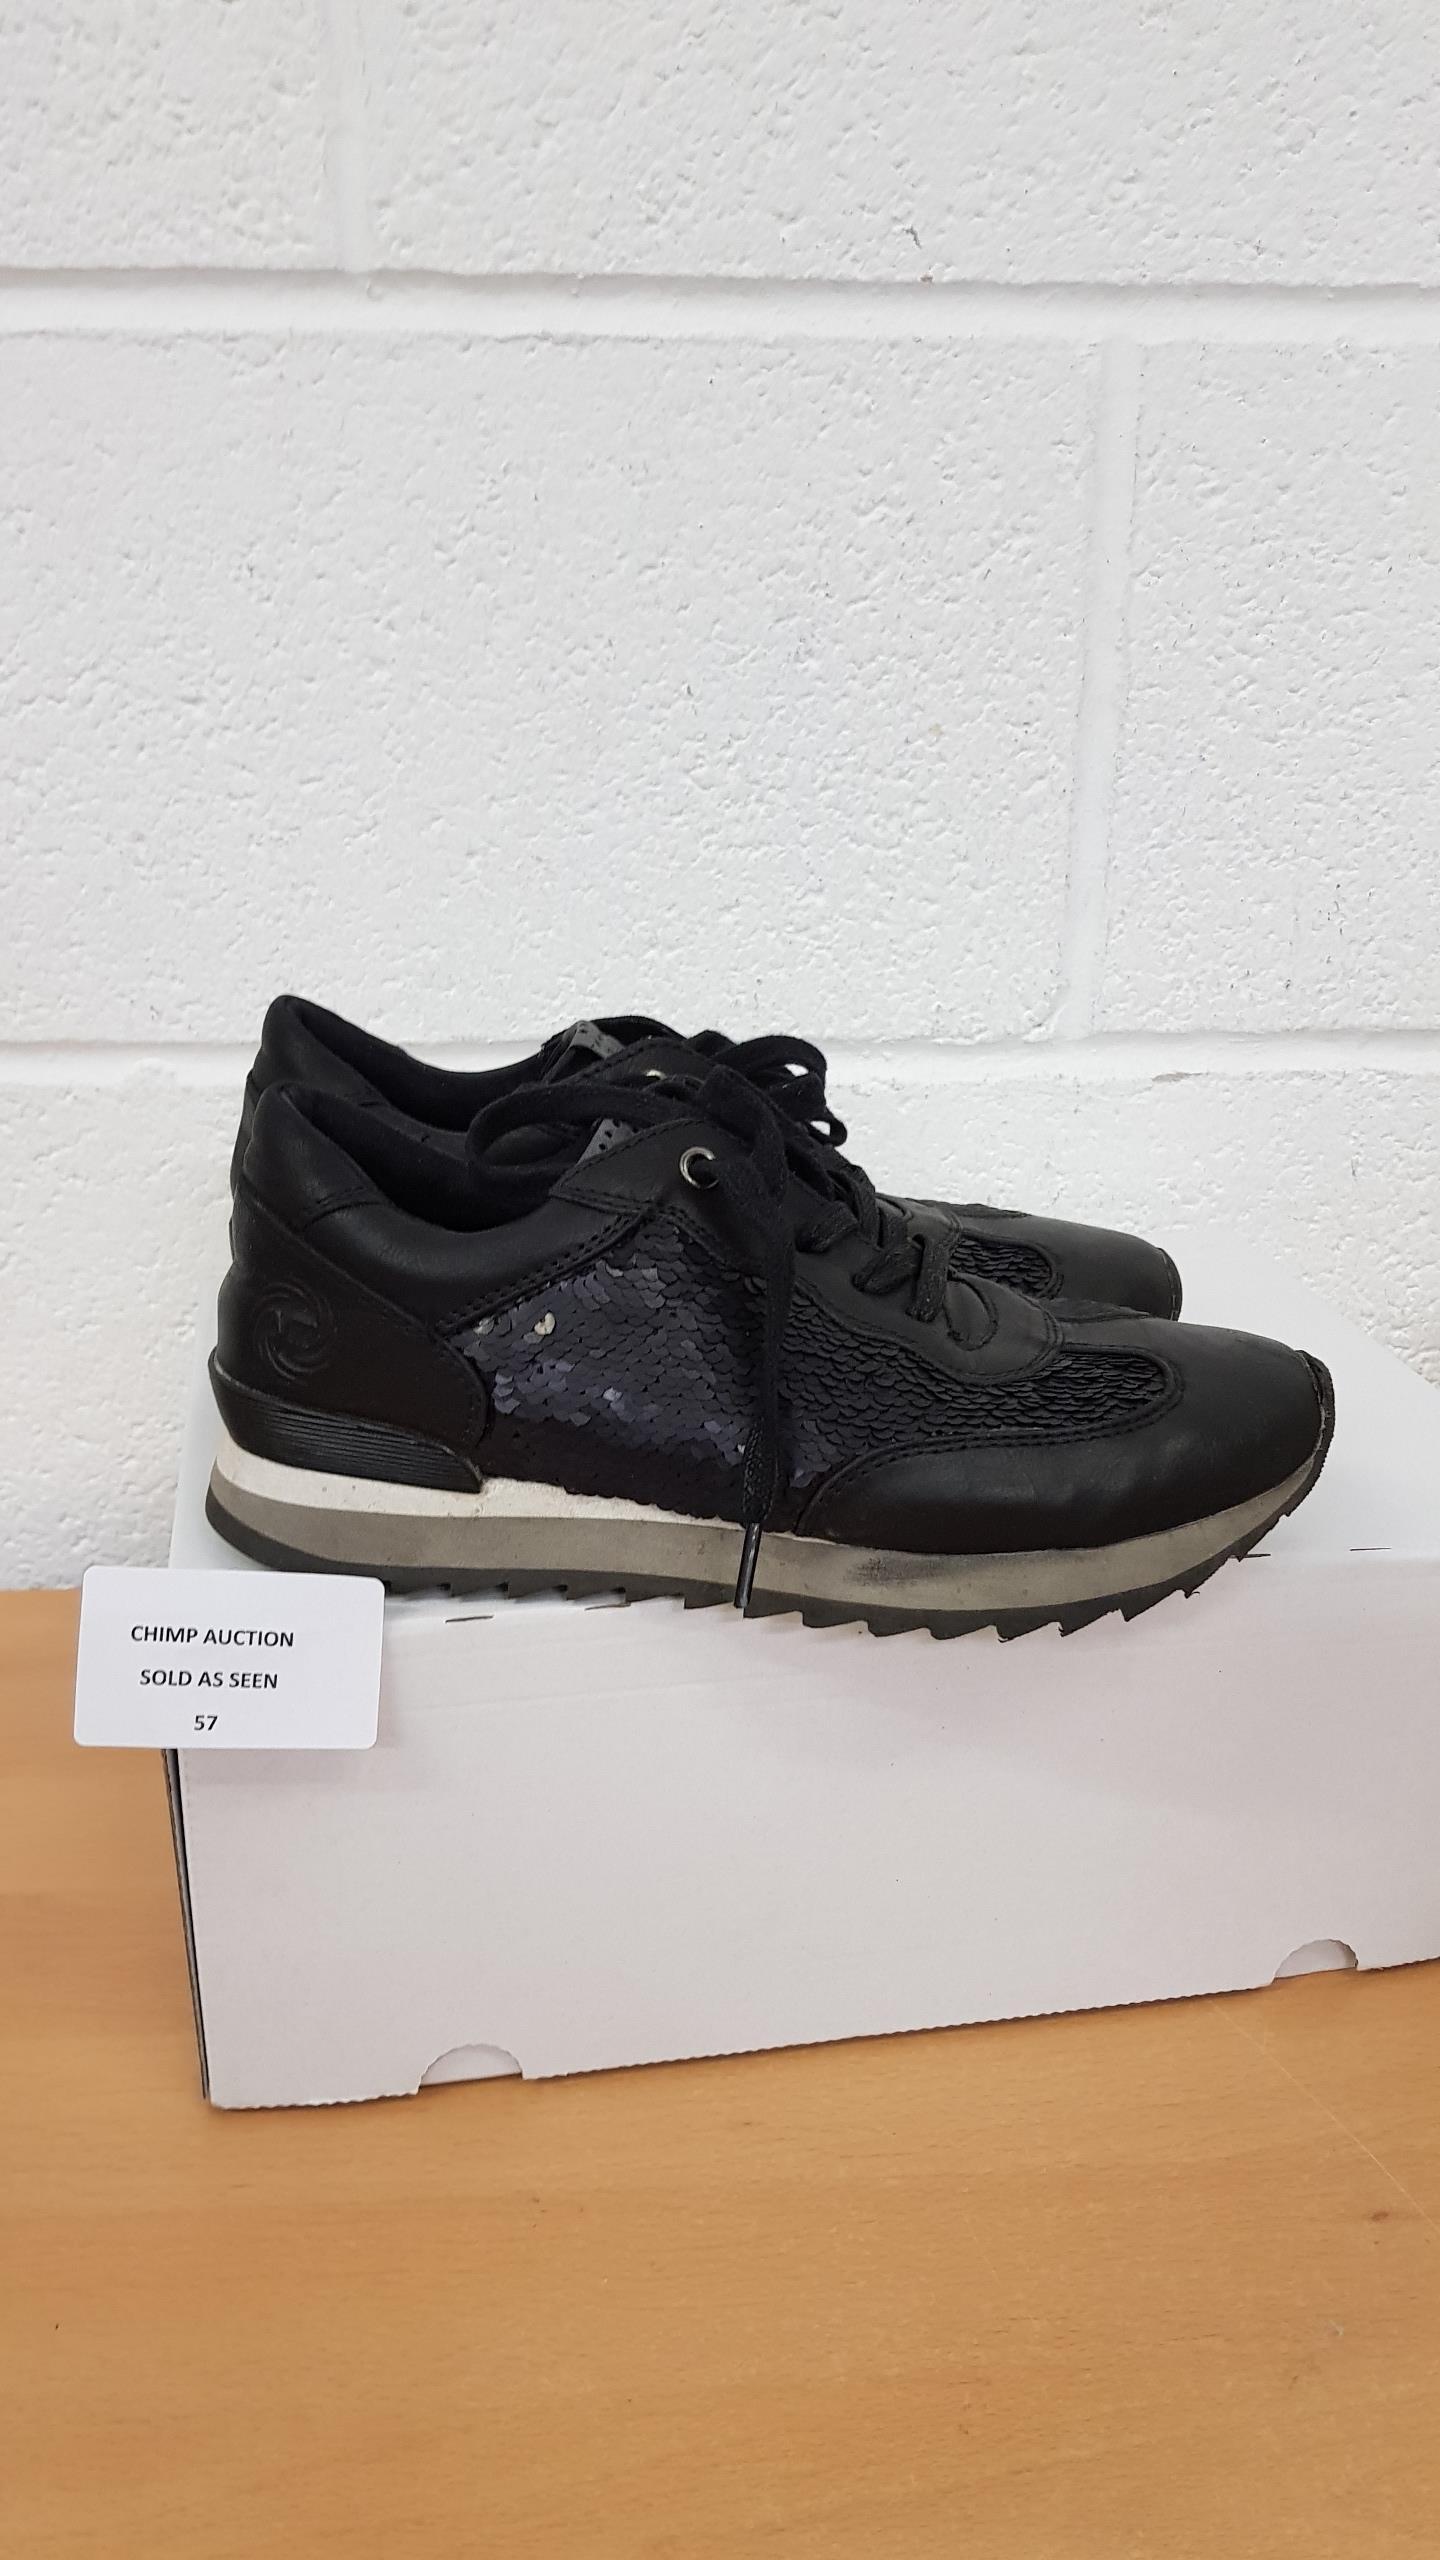 Lot 57 - Marco Tozzi ladies shoes EU 38